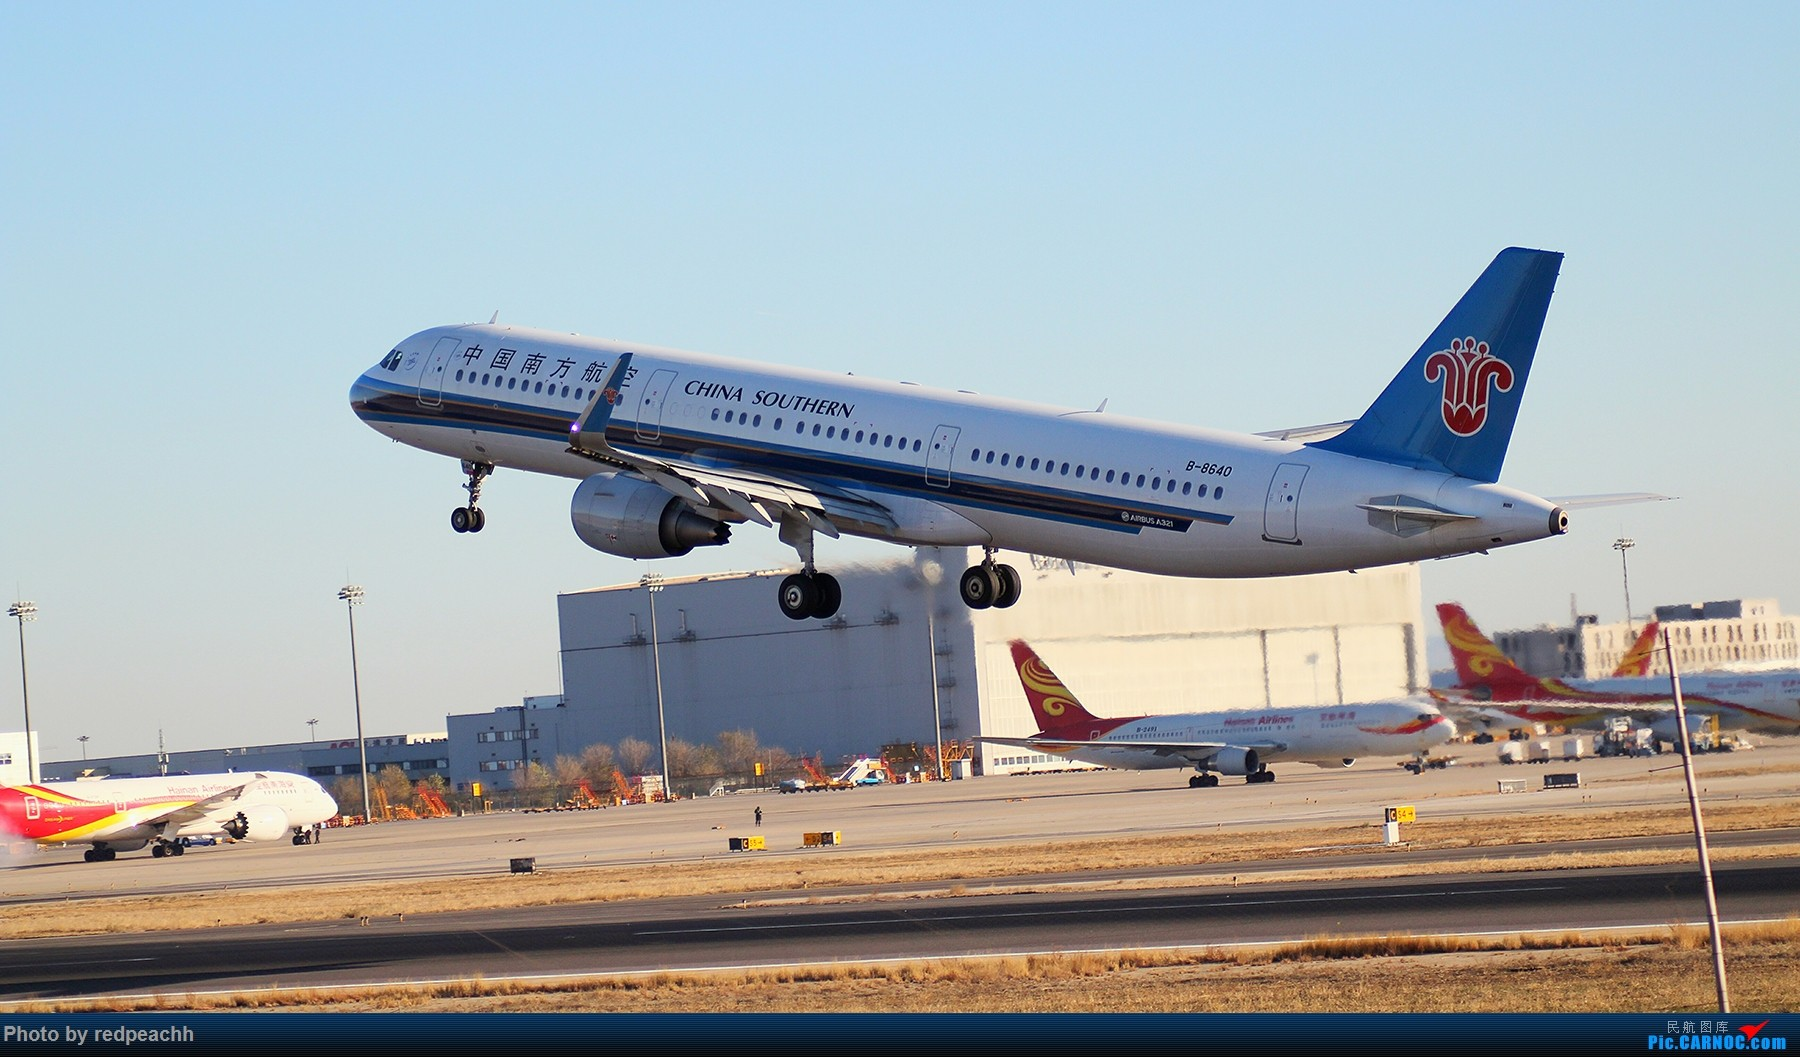 Re:[原创](持续更新)河北人为拍机而首都机场2日游(杨二营、八卦台)虽均为常规货但值得纪念(36L) AIRBUS A321-200 B-8640 中国北京首都国际机场